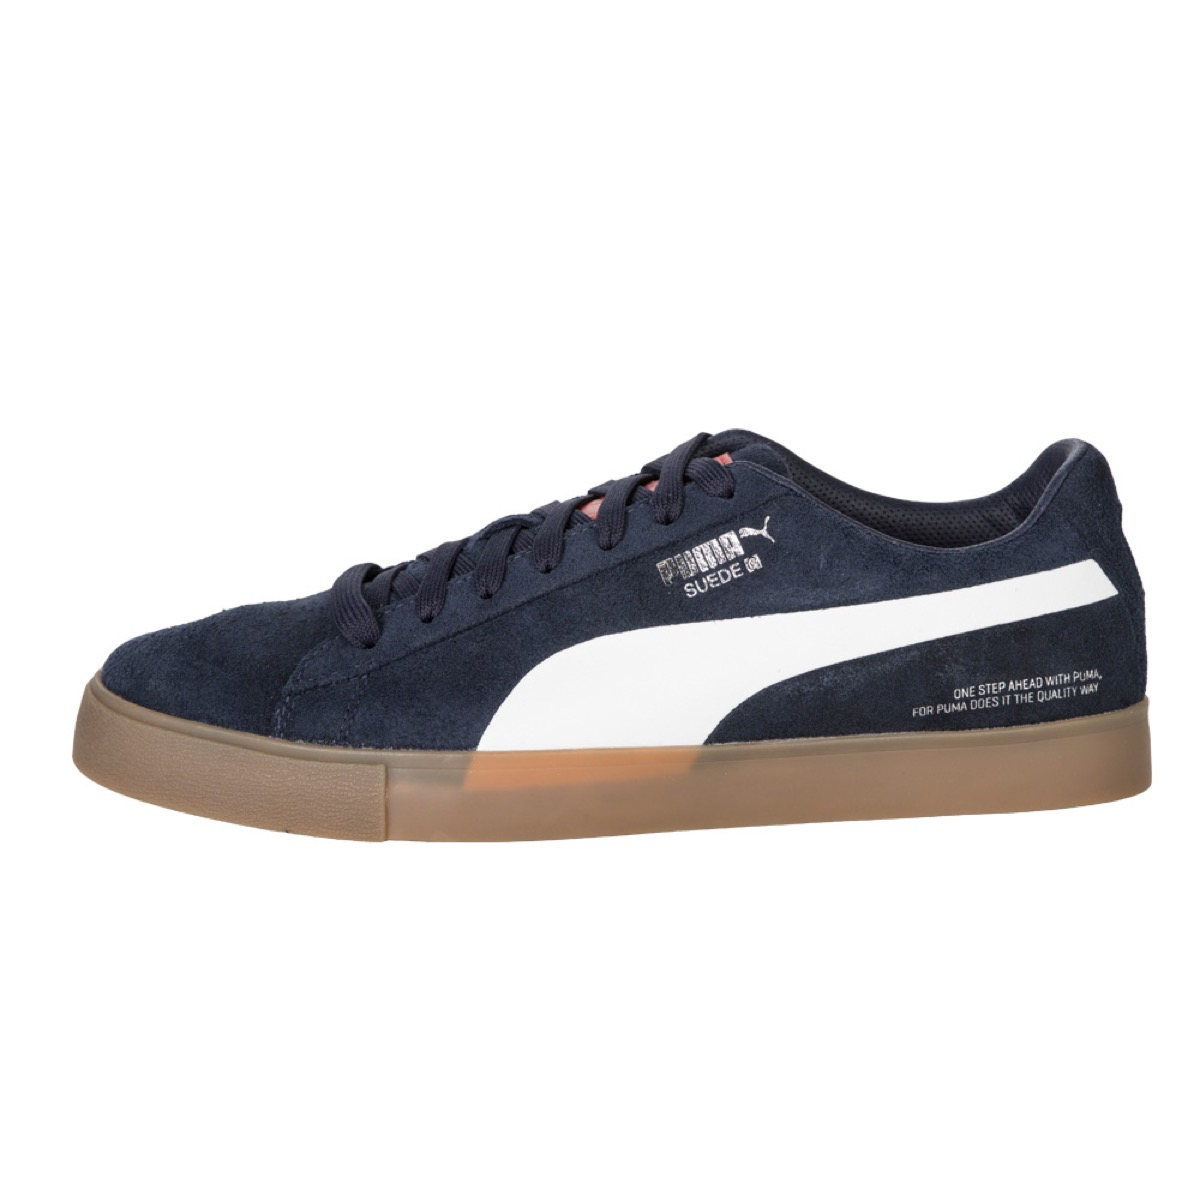 Puma Malbon Golf Shoes